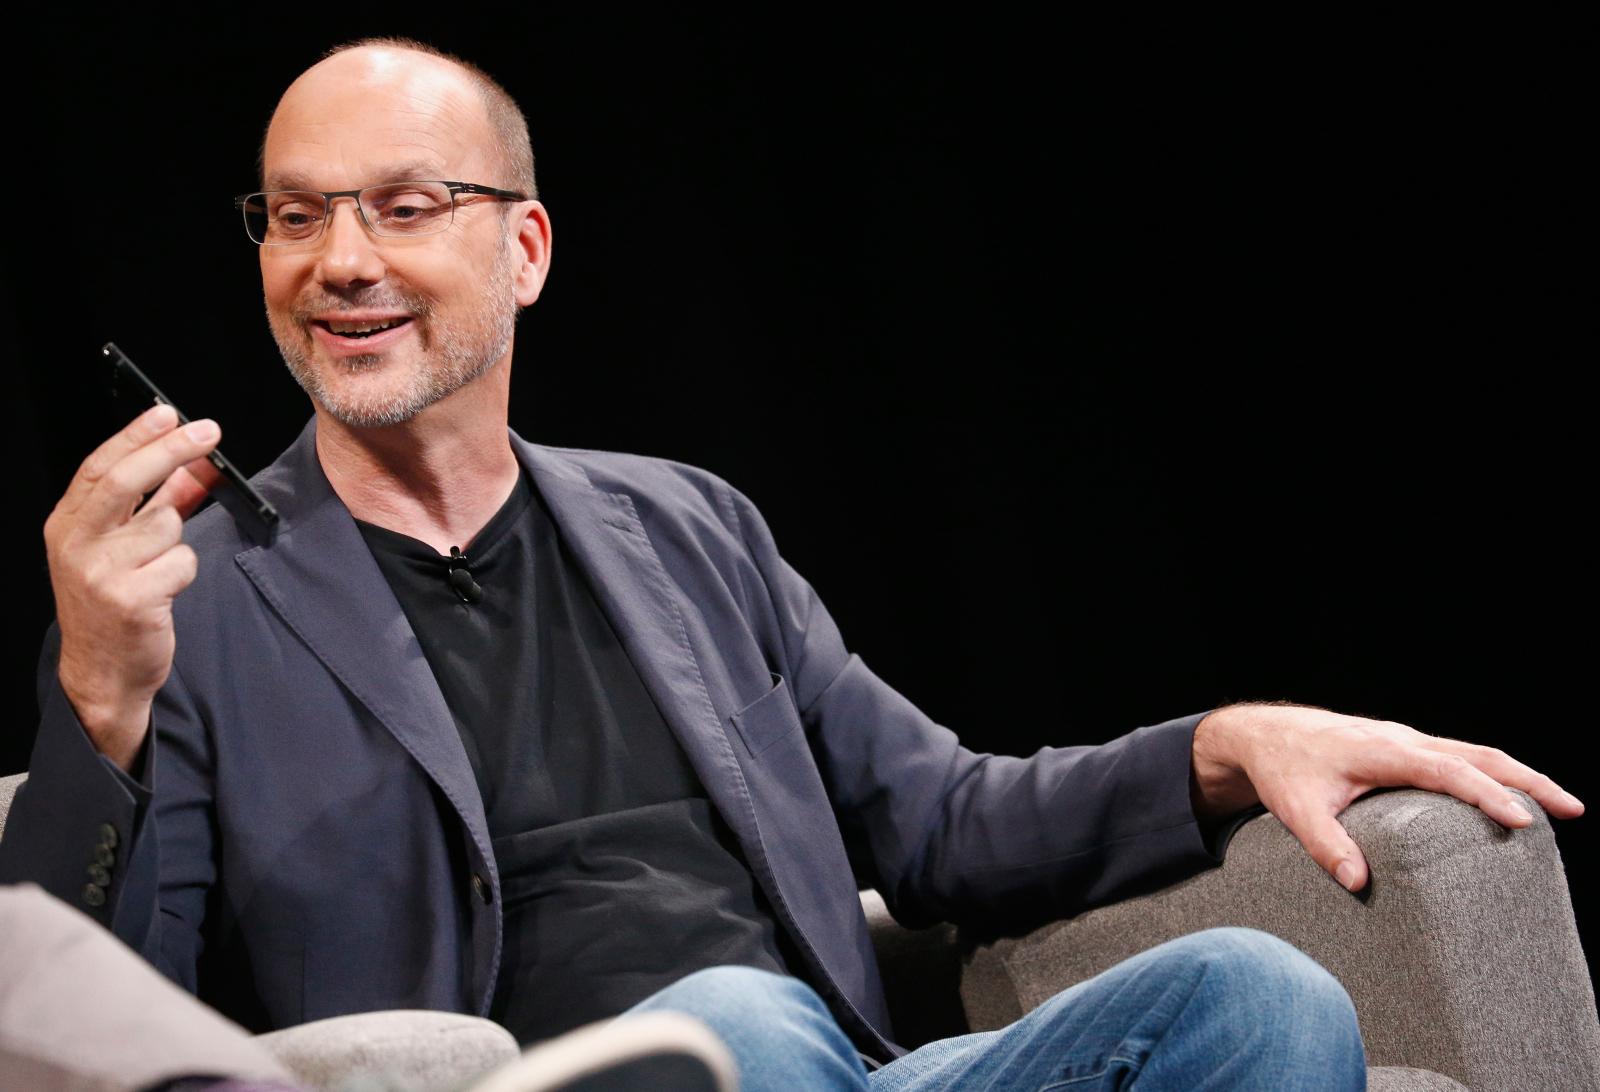 Android creator Andy Rubin